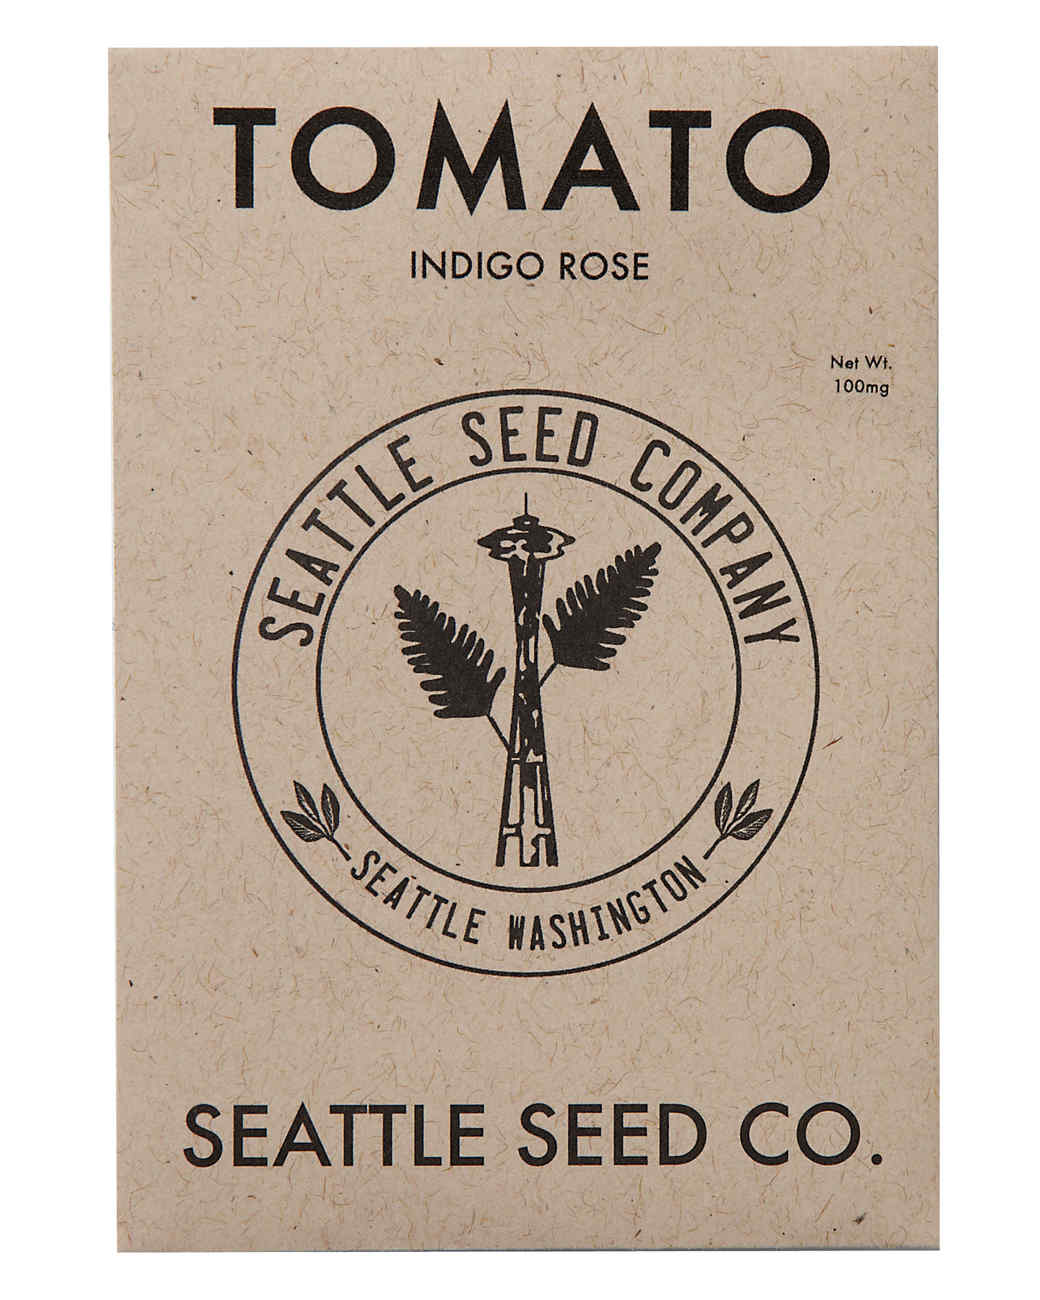 indigo-rose-tomato-seed-mld110379.jpg